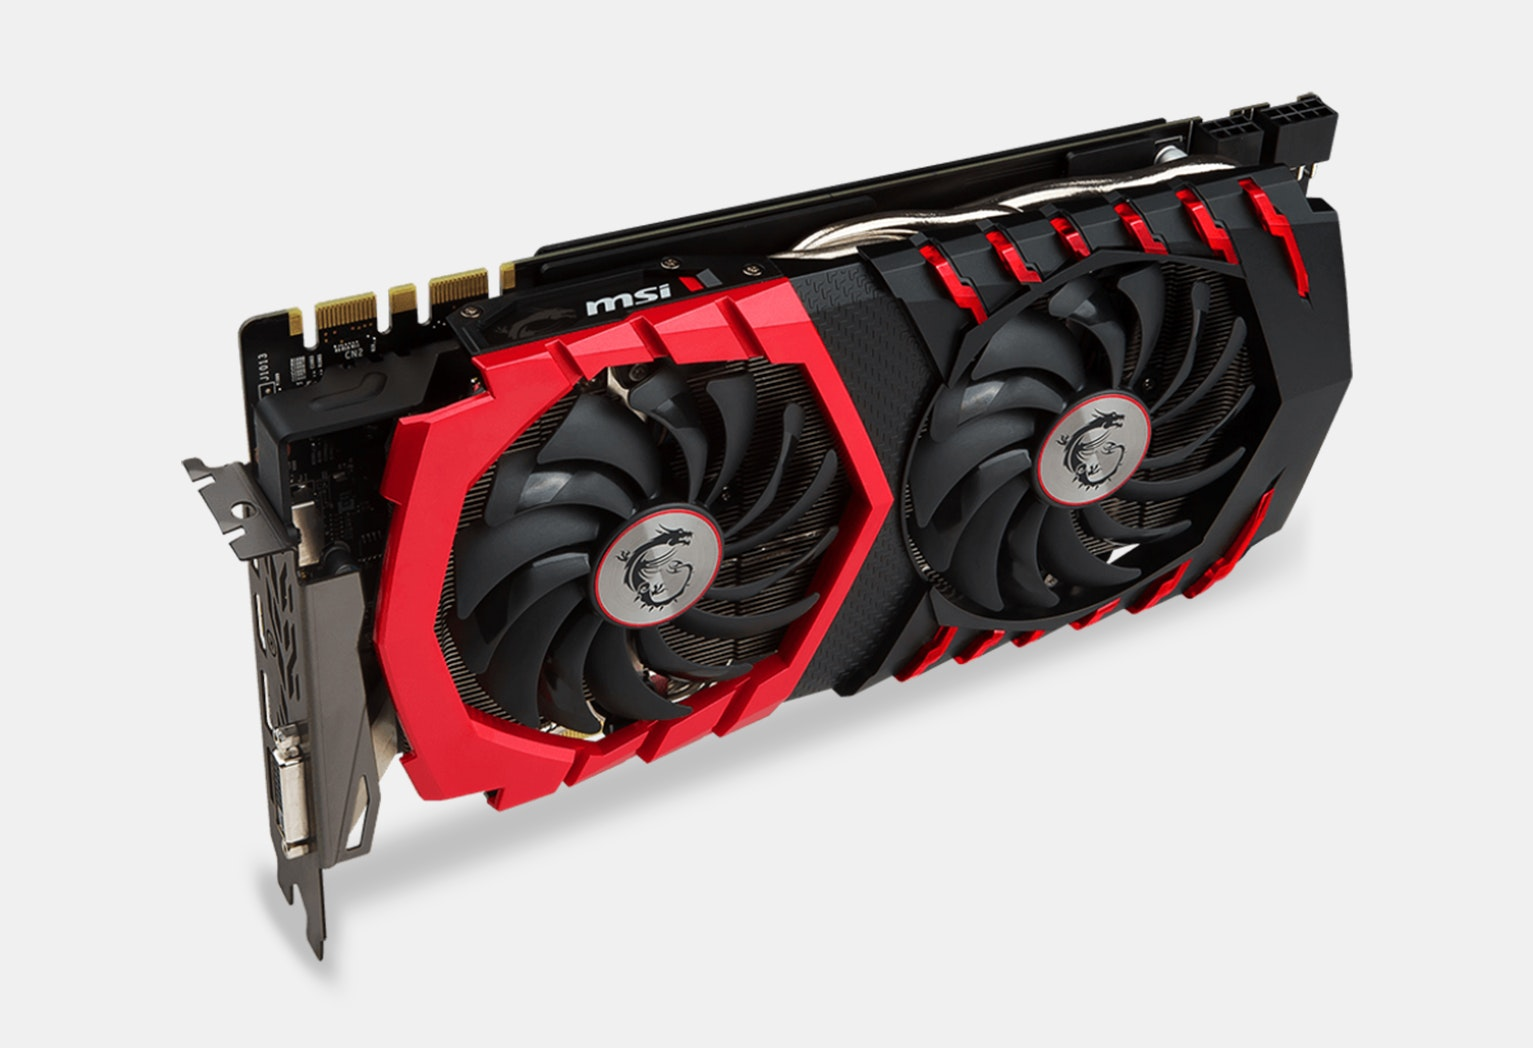 MSI GEFORCE GTX 1070 Gaming X 8G Card –Flash Sale